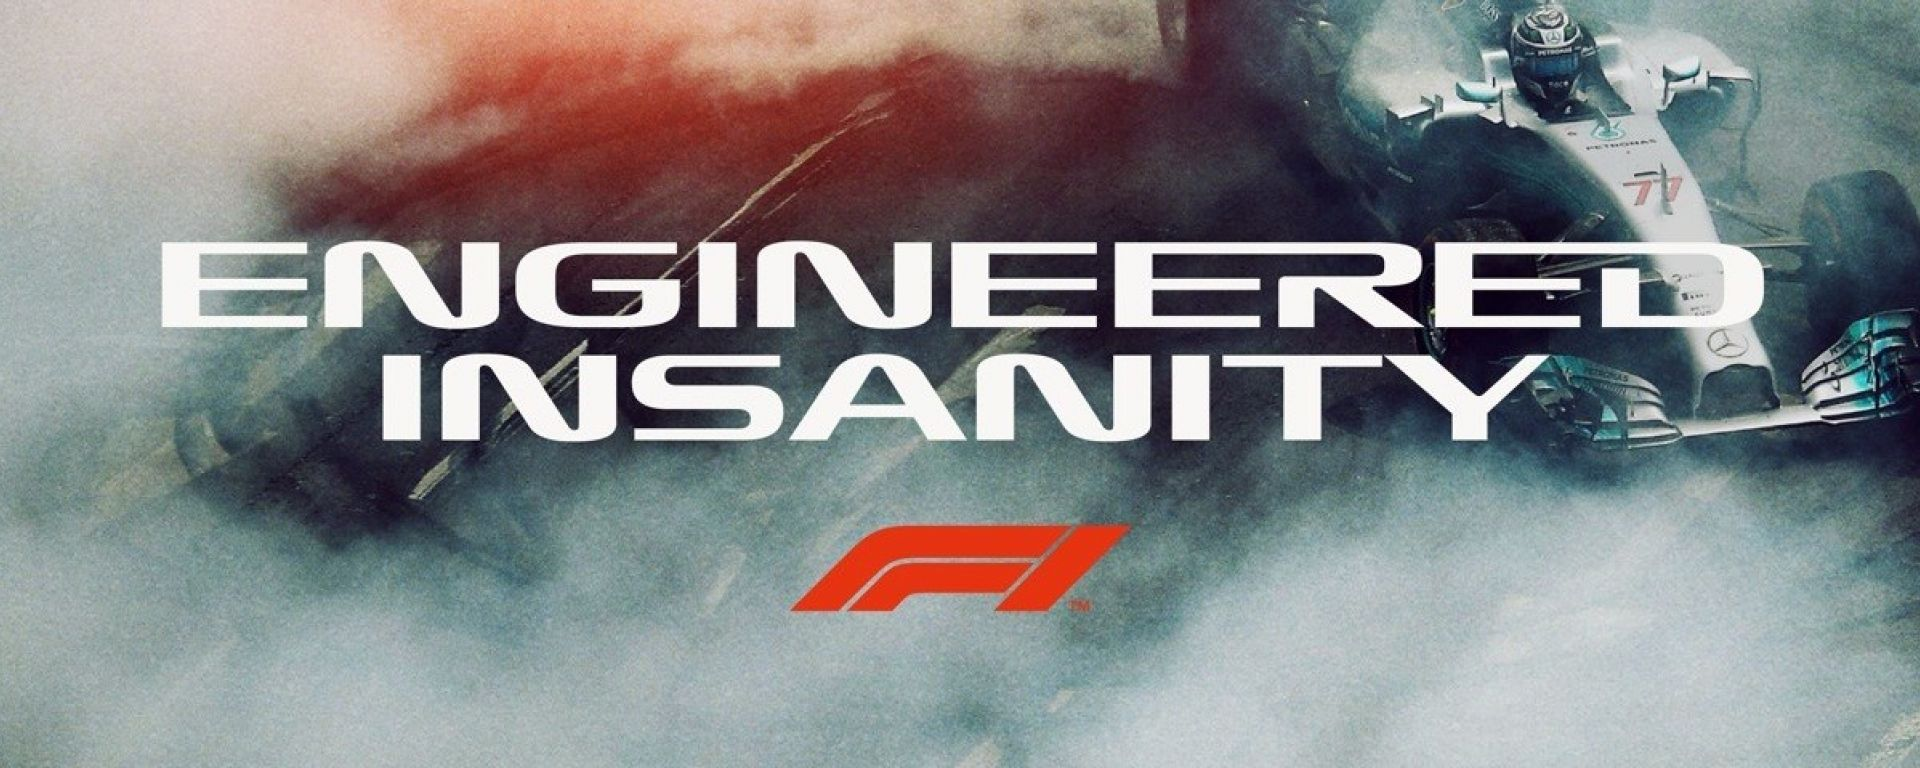 Formula 1 Engineered Insanity